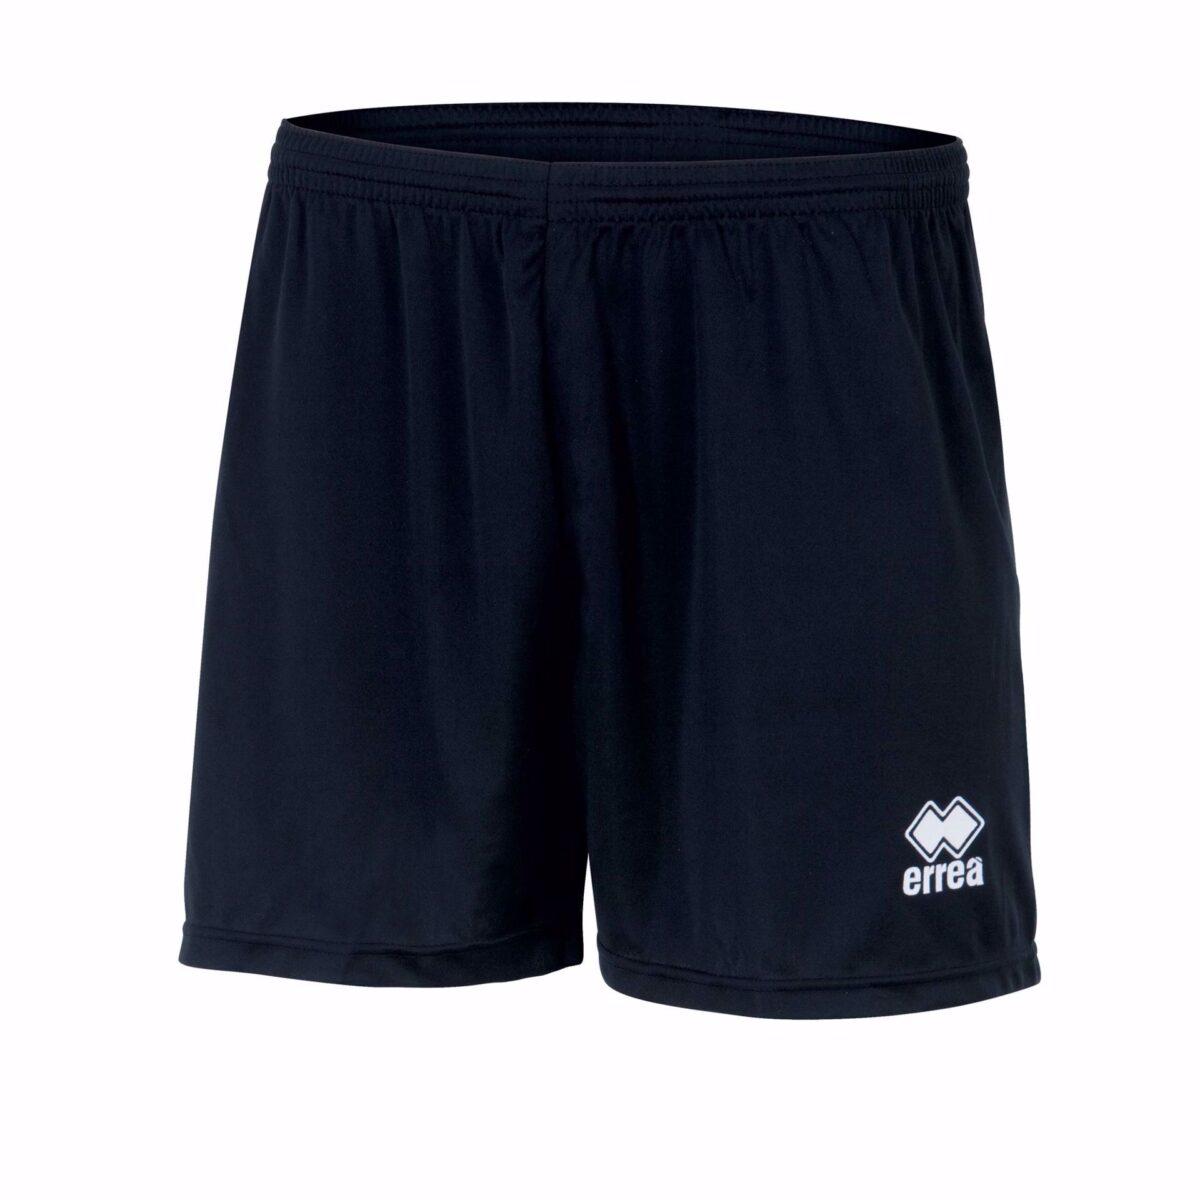 Tiverton Town Development FC Training Shorts - New Skin A245 000012